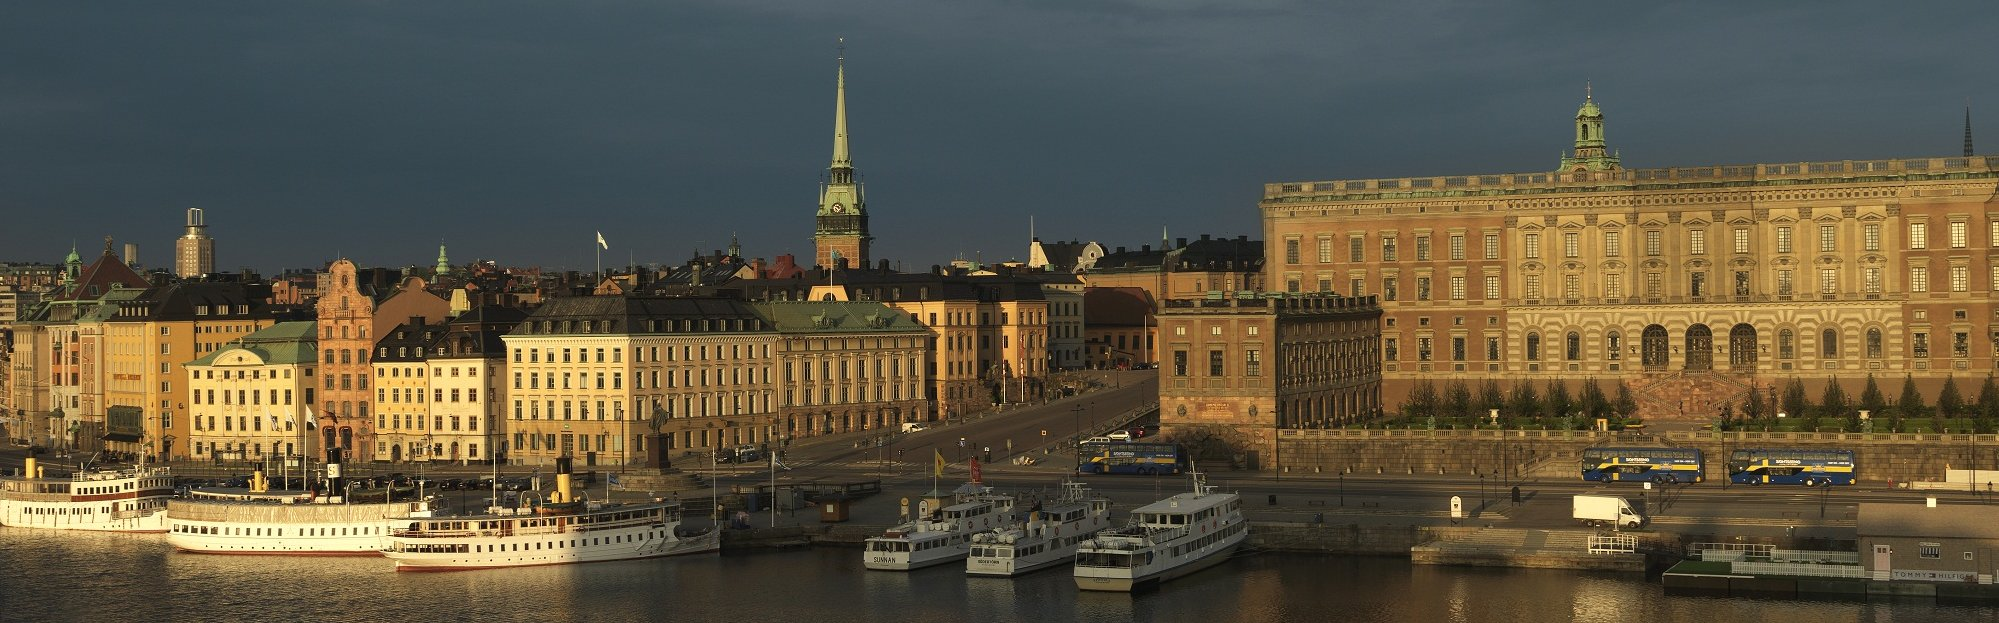 royal-palace-stockholm